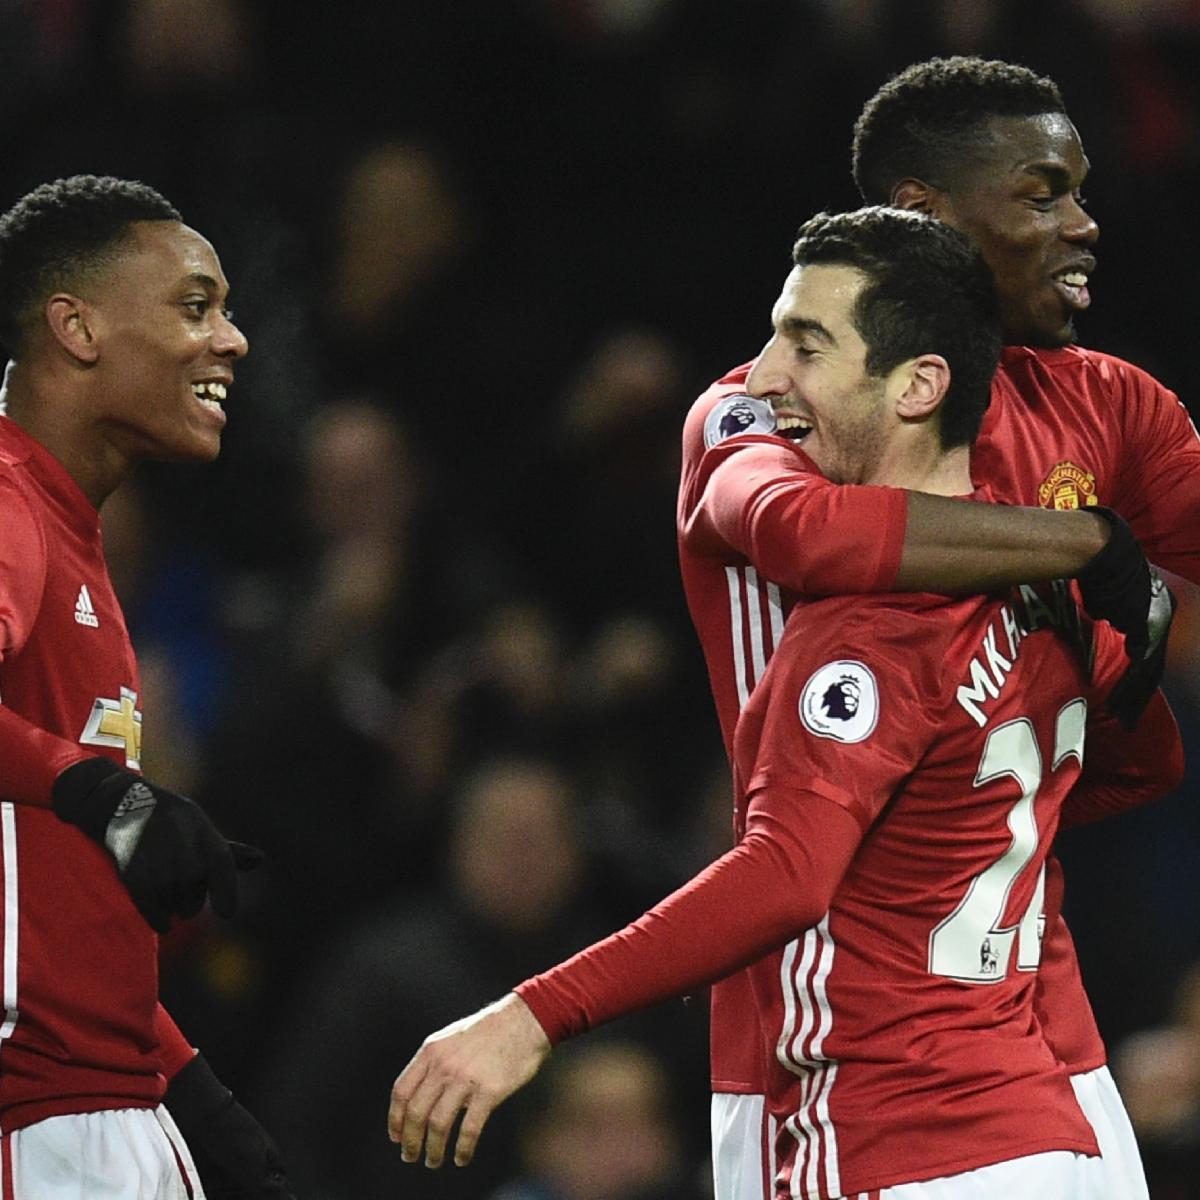 Manchester United S Anthony Martial Talks Debut Goal Vs: Jose Mourinho Compares Anthony Martial, Henrikh Mkhitaryan